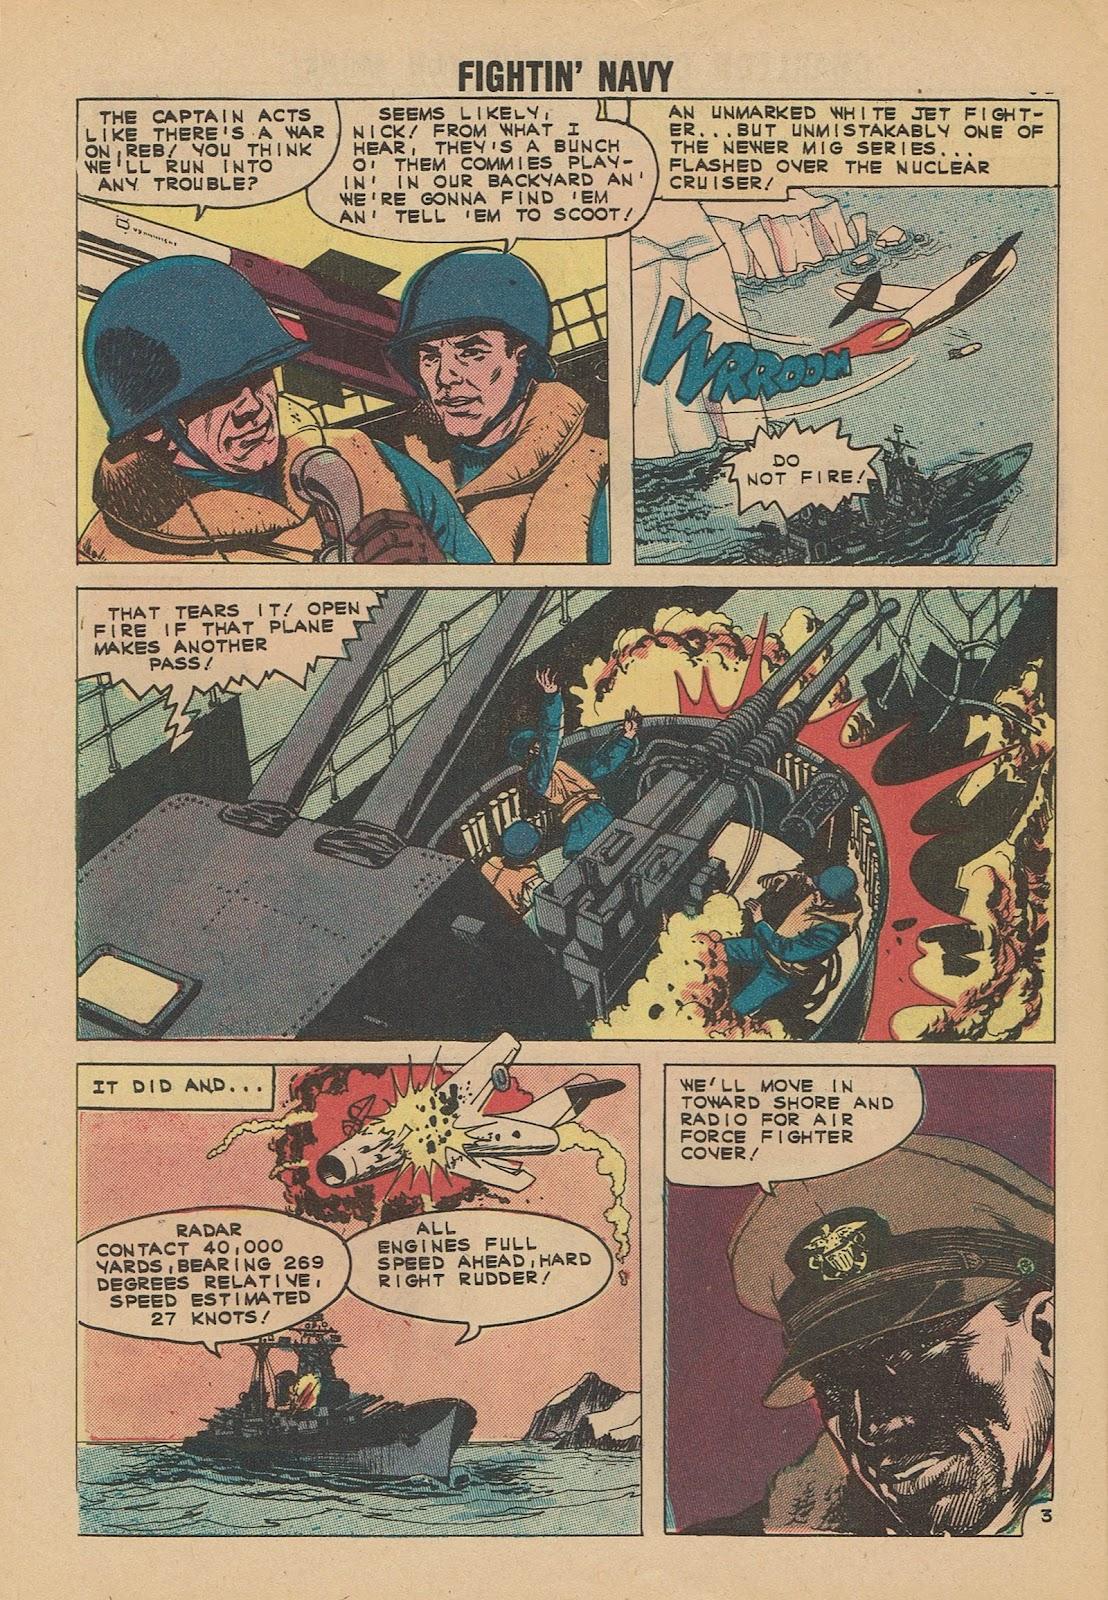 Read online Fightin' Navy comic -  Issue #101 - 28